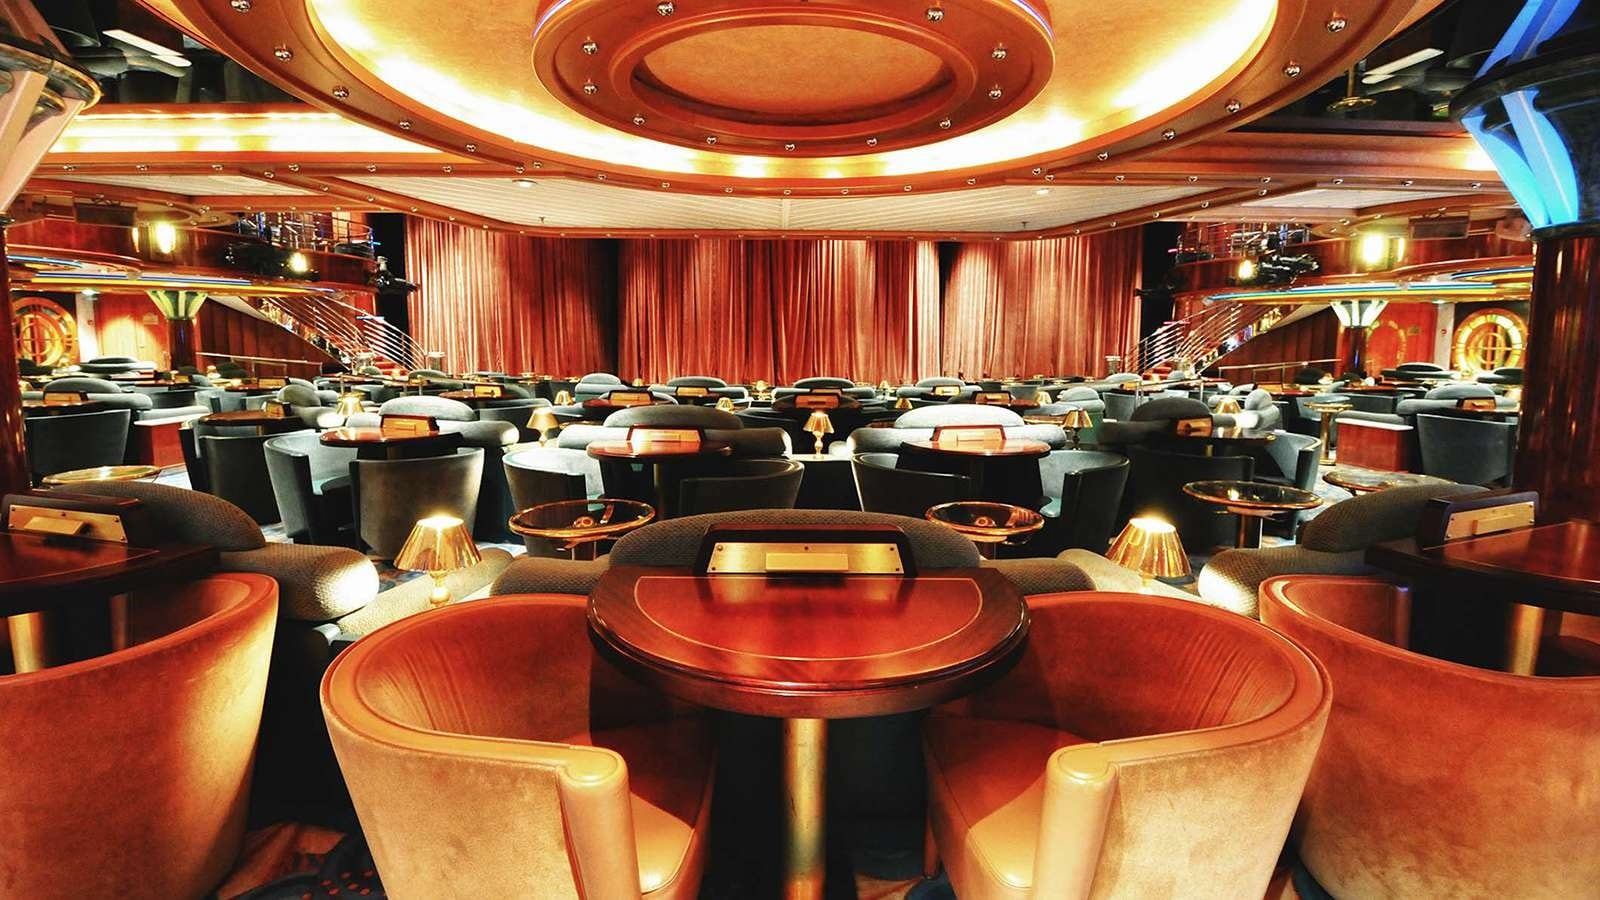 宇宙酒廊 Universe Lounge